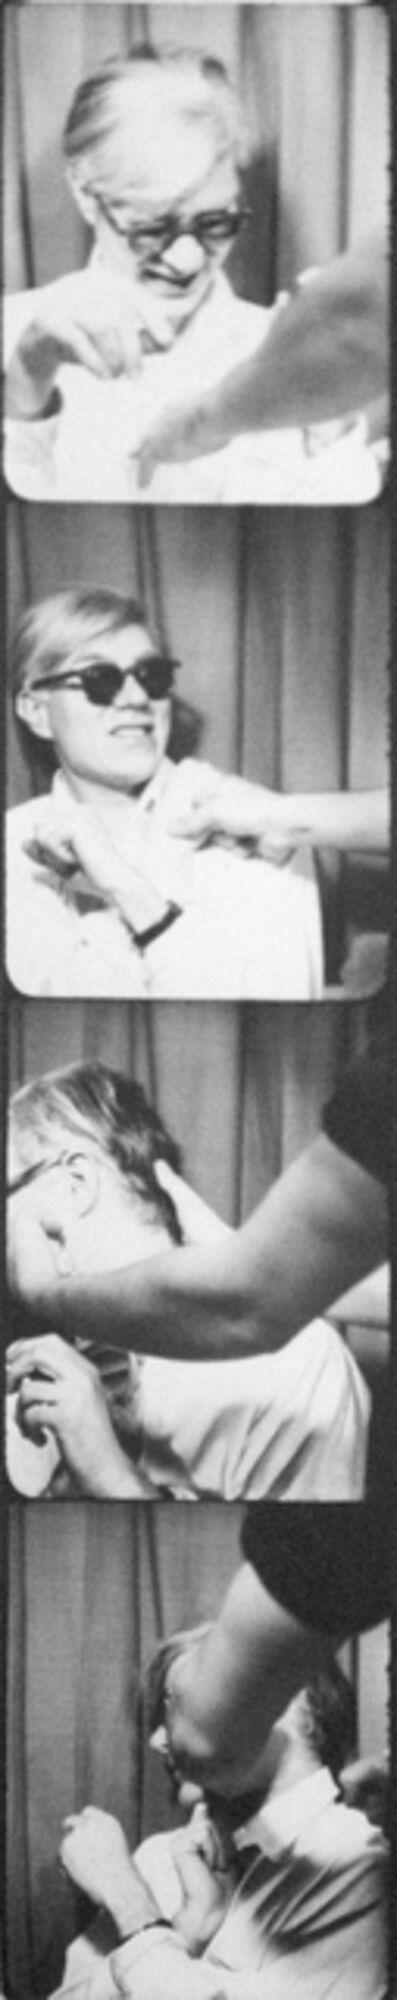 Andy Warhol, 'Self Portrait', 1963-1964